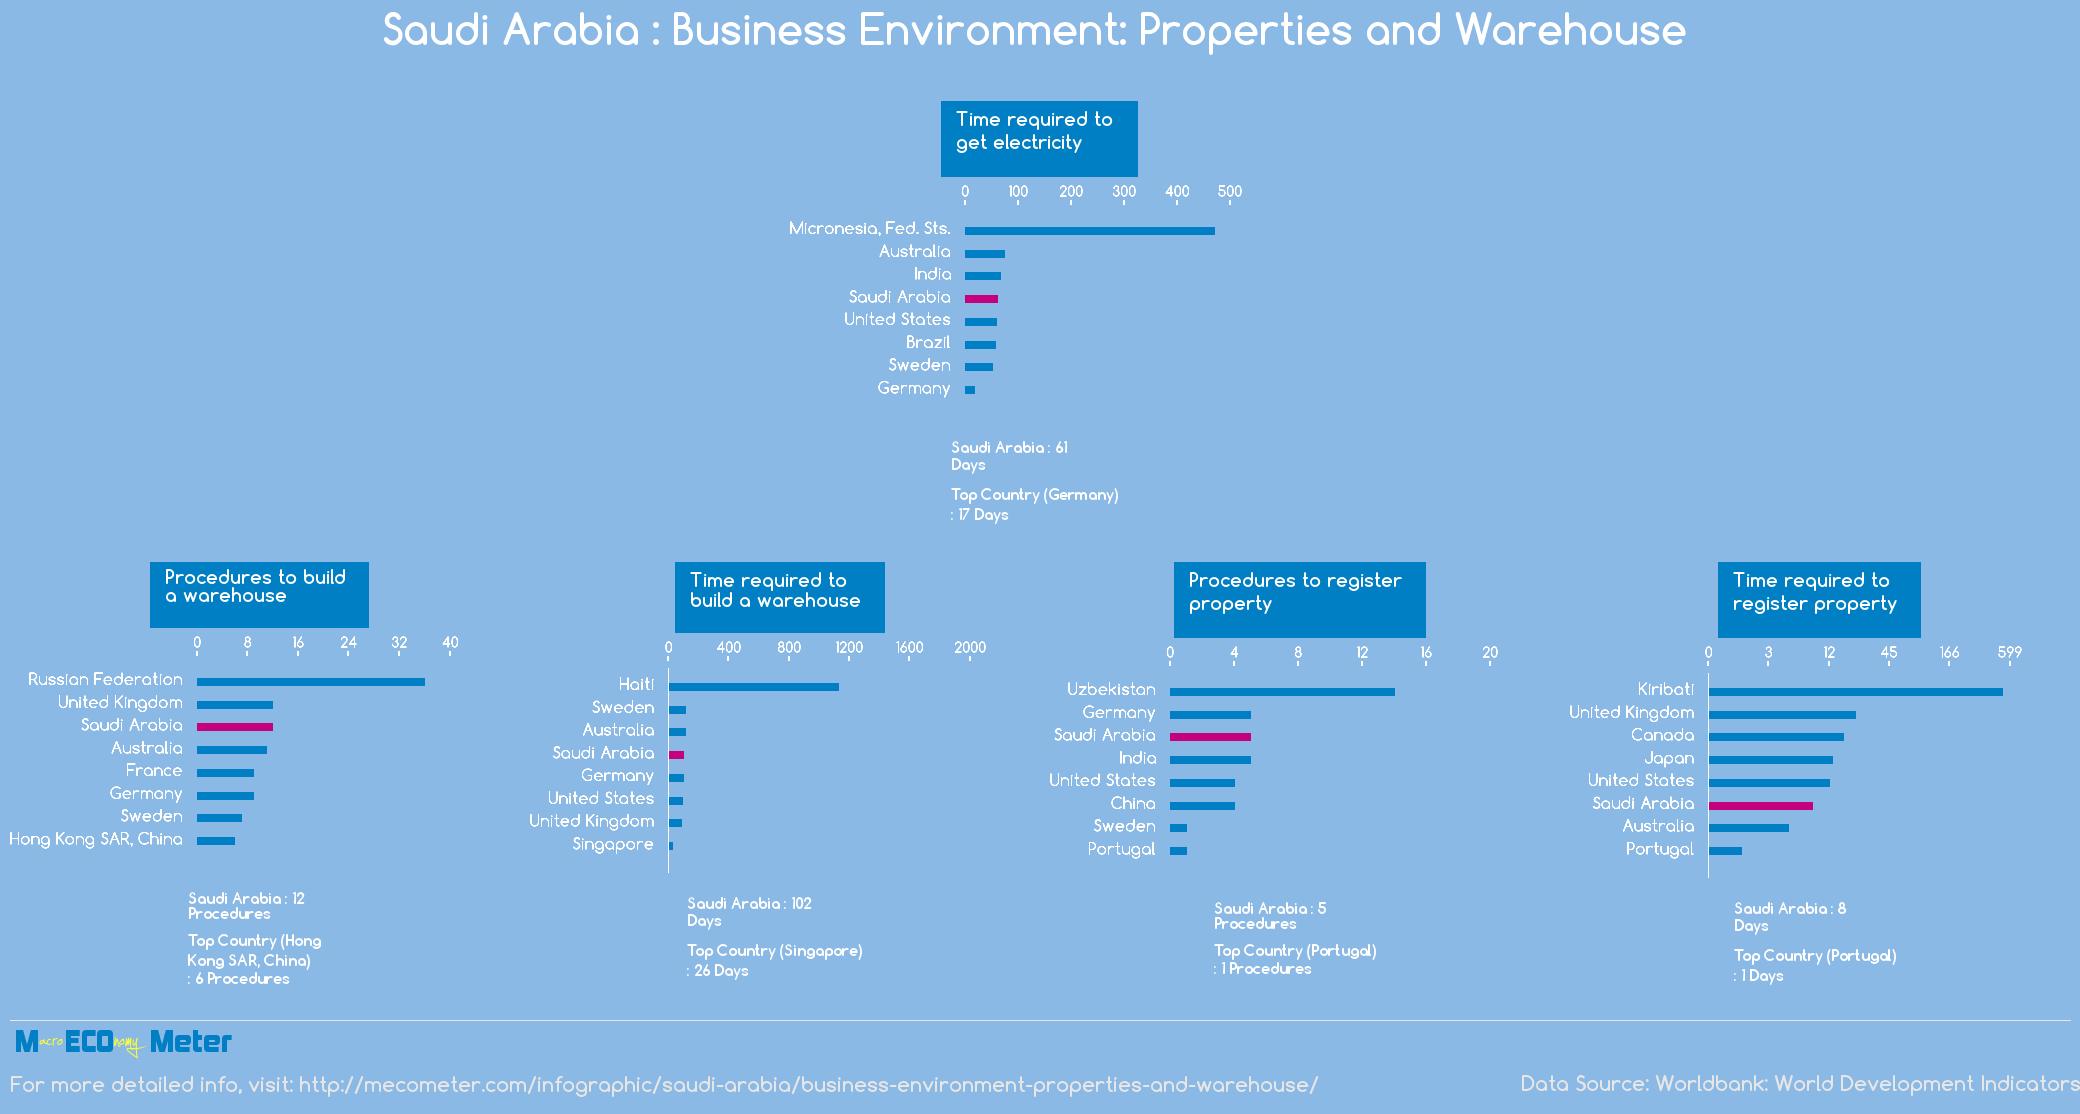 Saudi Arabia : Business Environment: Properties and Warehouse